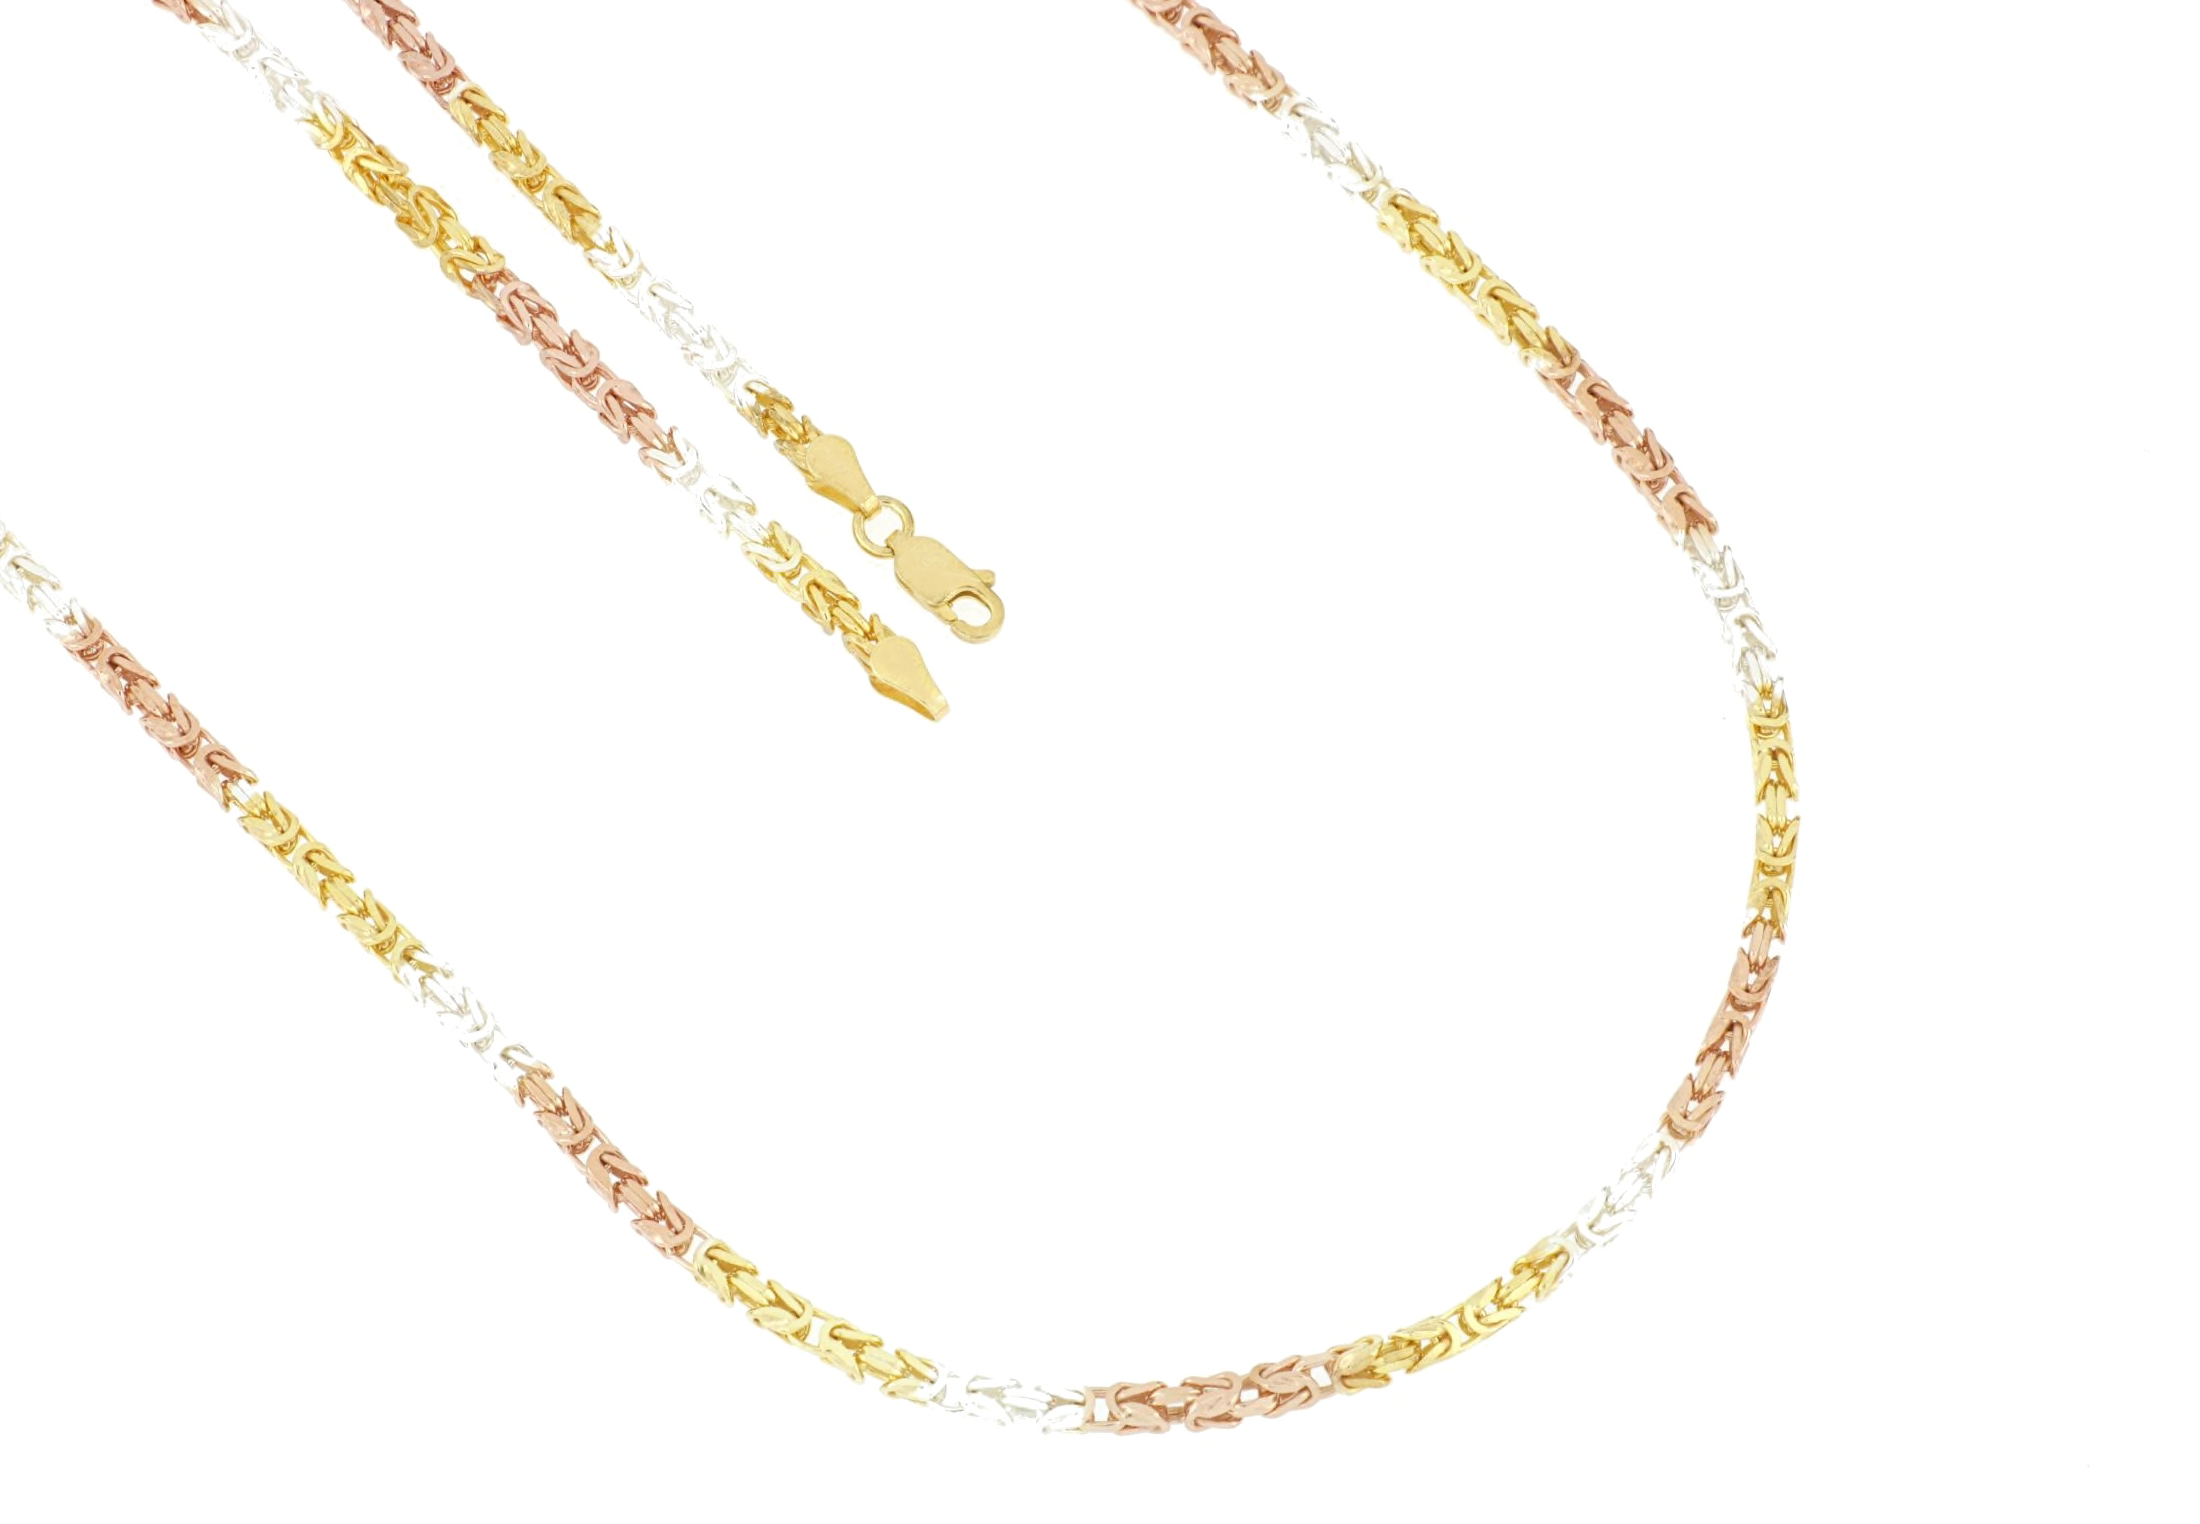 La Piora Armband Königsarmband, glanz, quadratisch, 925/- Sterlingsilber tr günstig online kaufen